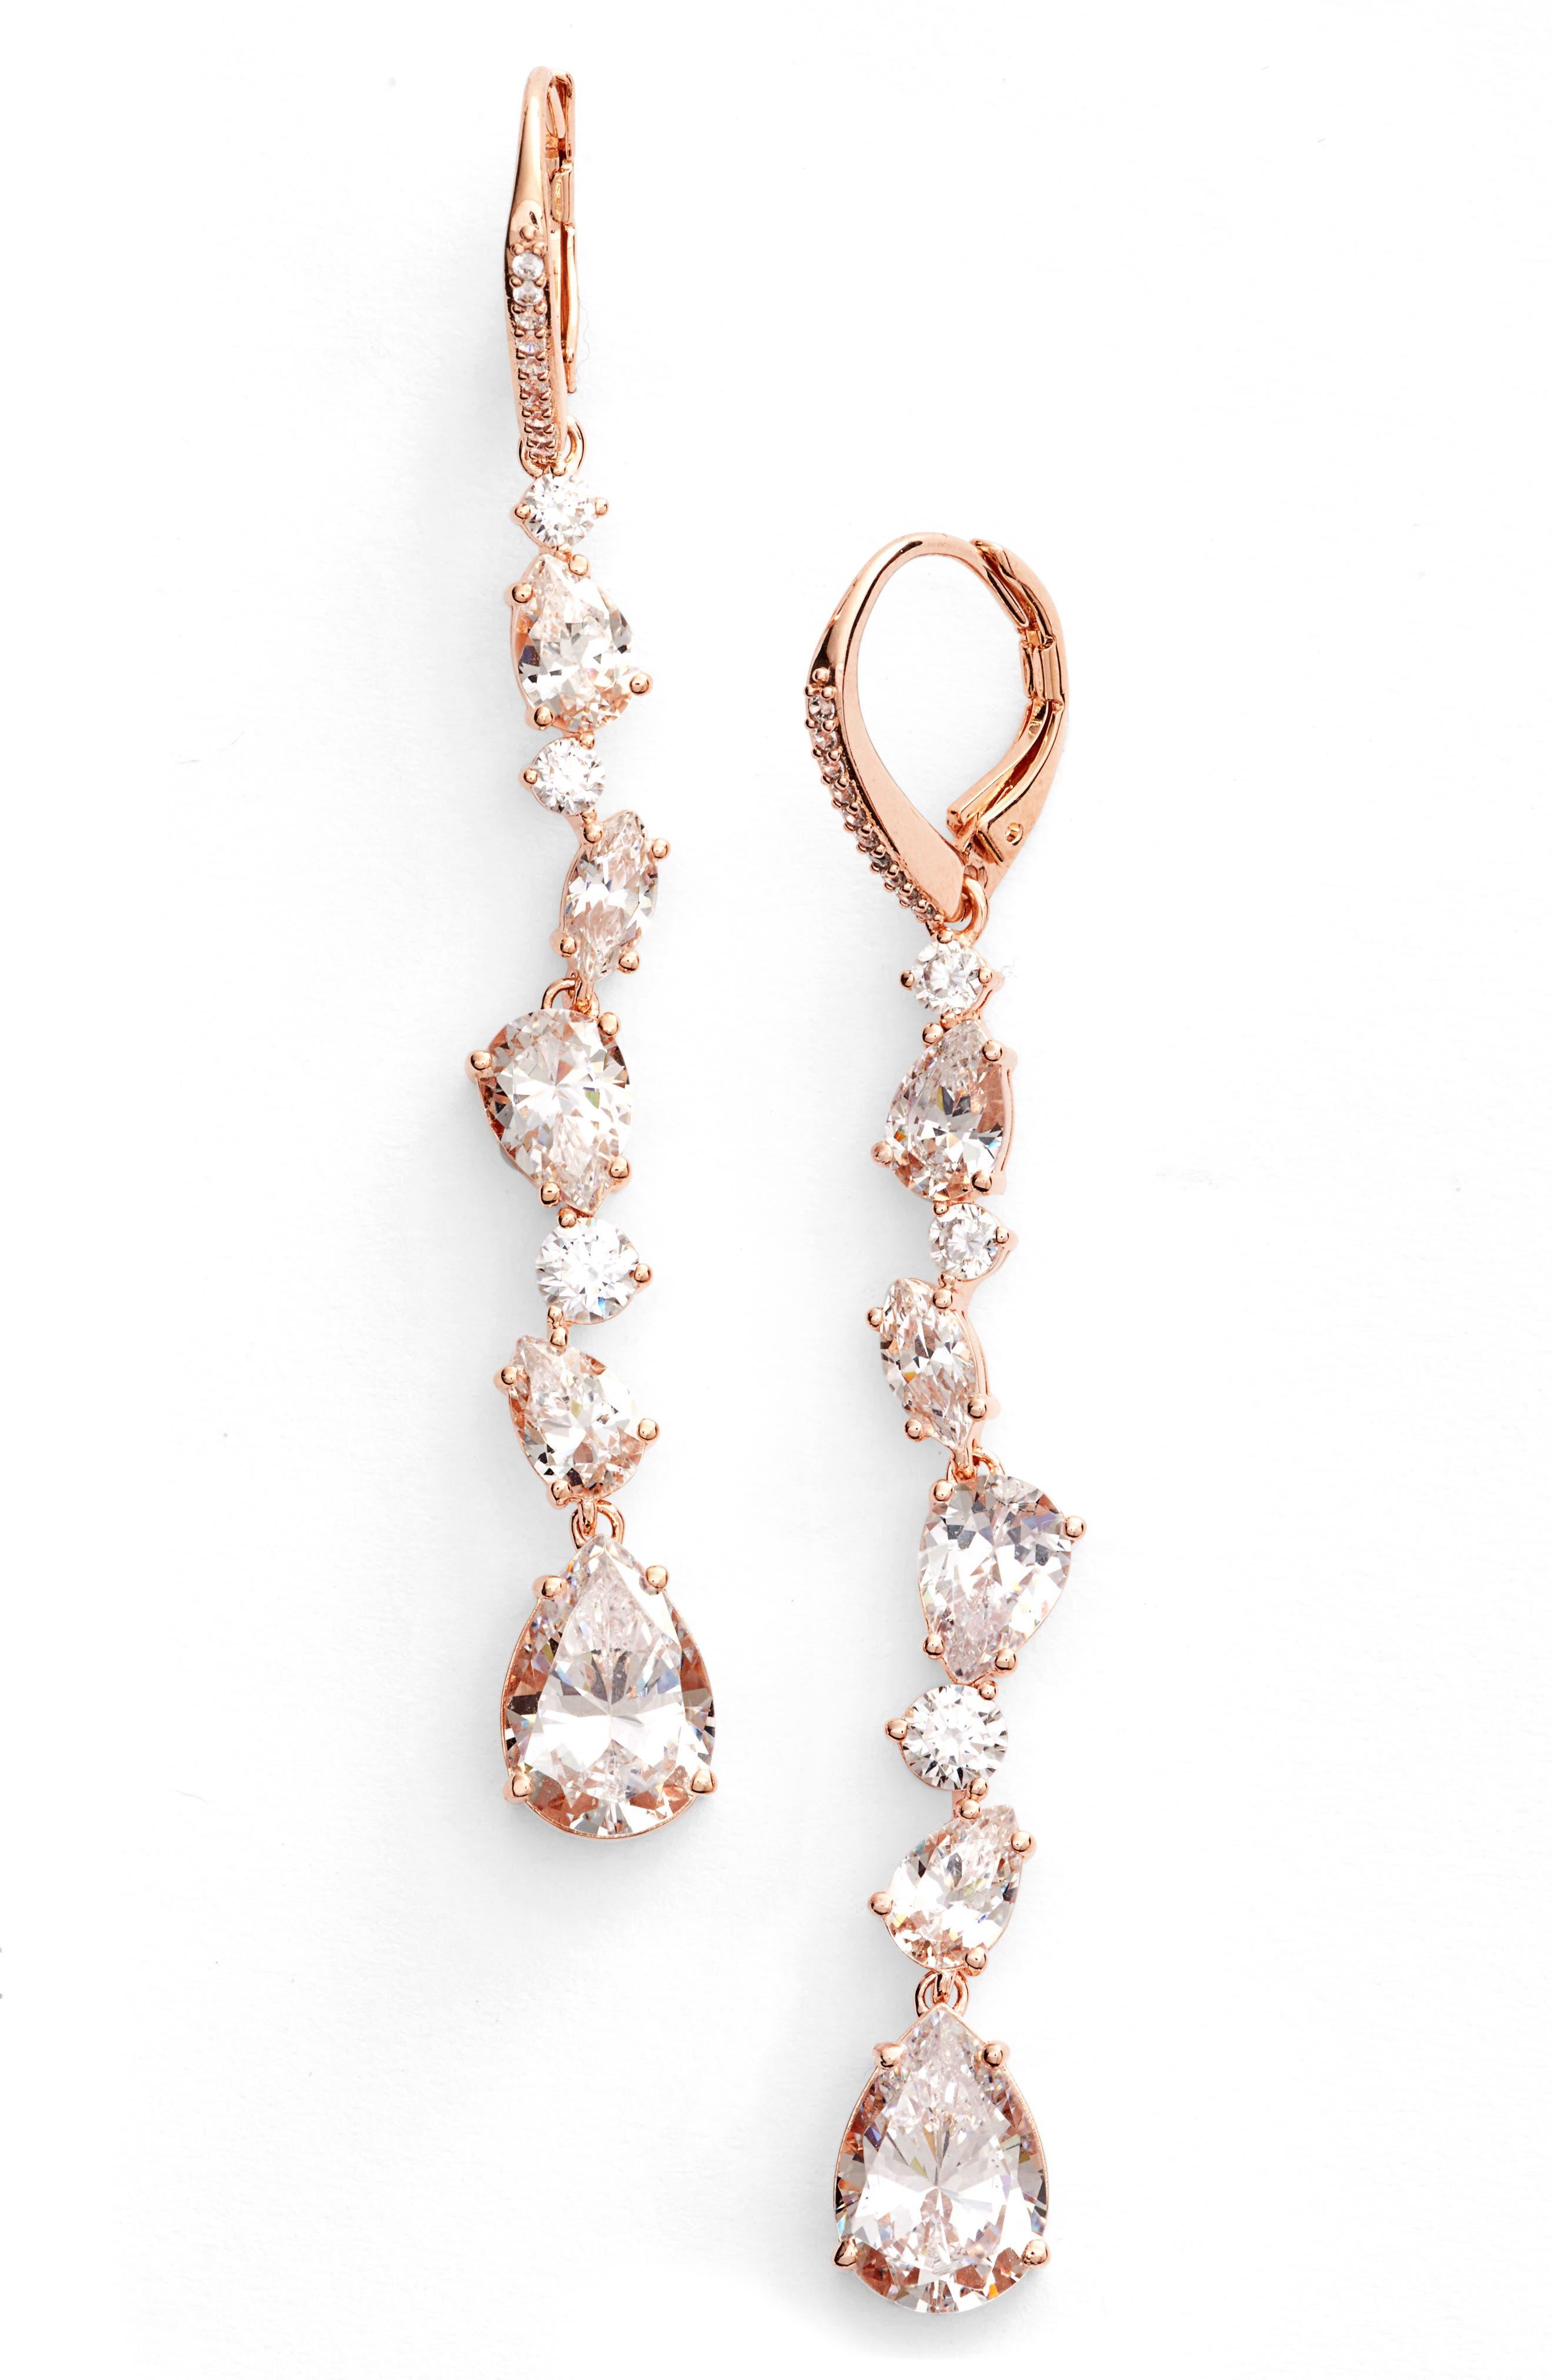 Ava Linear Drop Earrings,                             Main thumbnail 1, color,                             Rose Gold